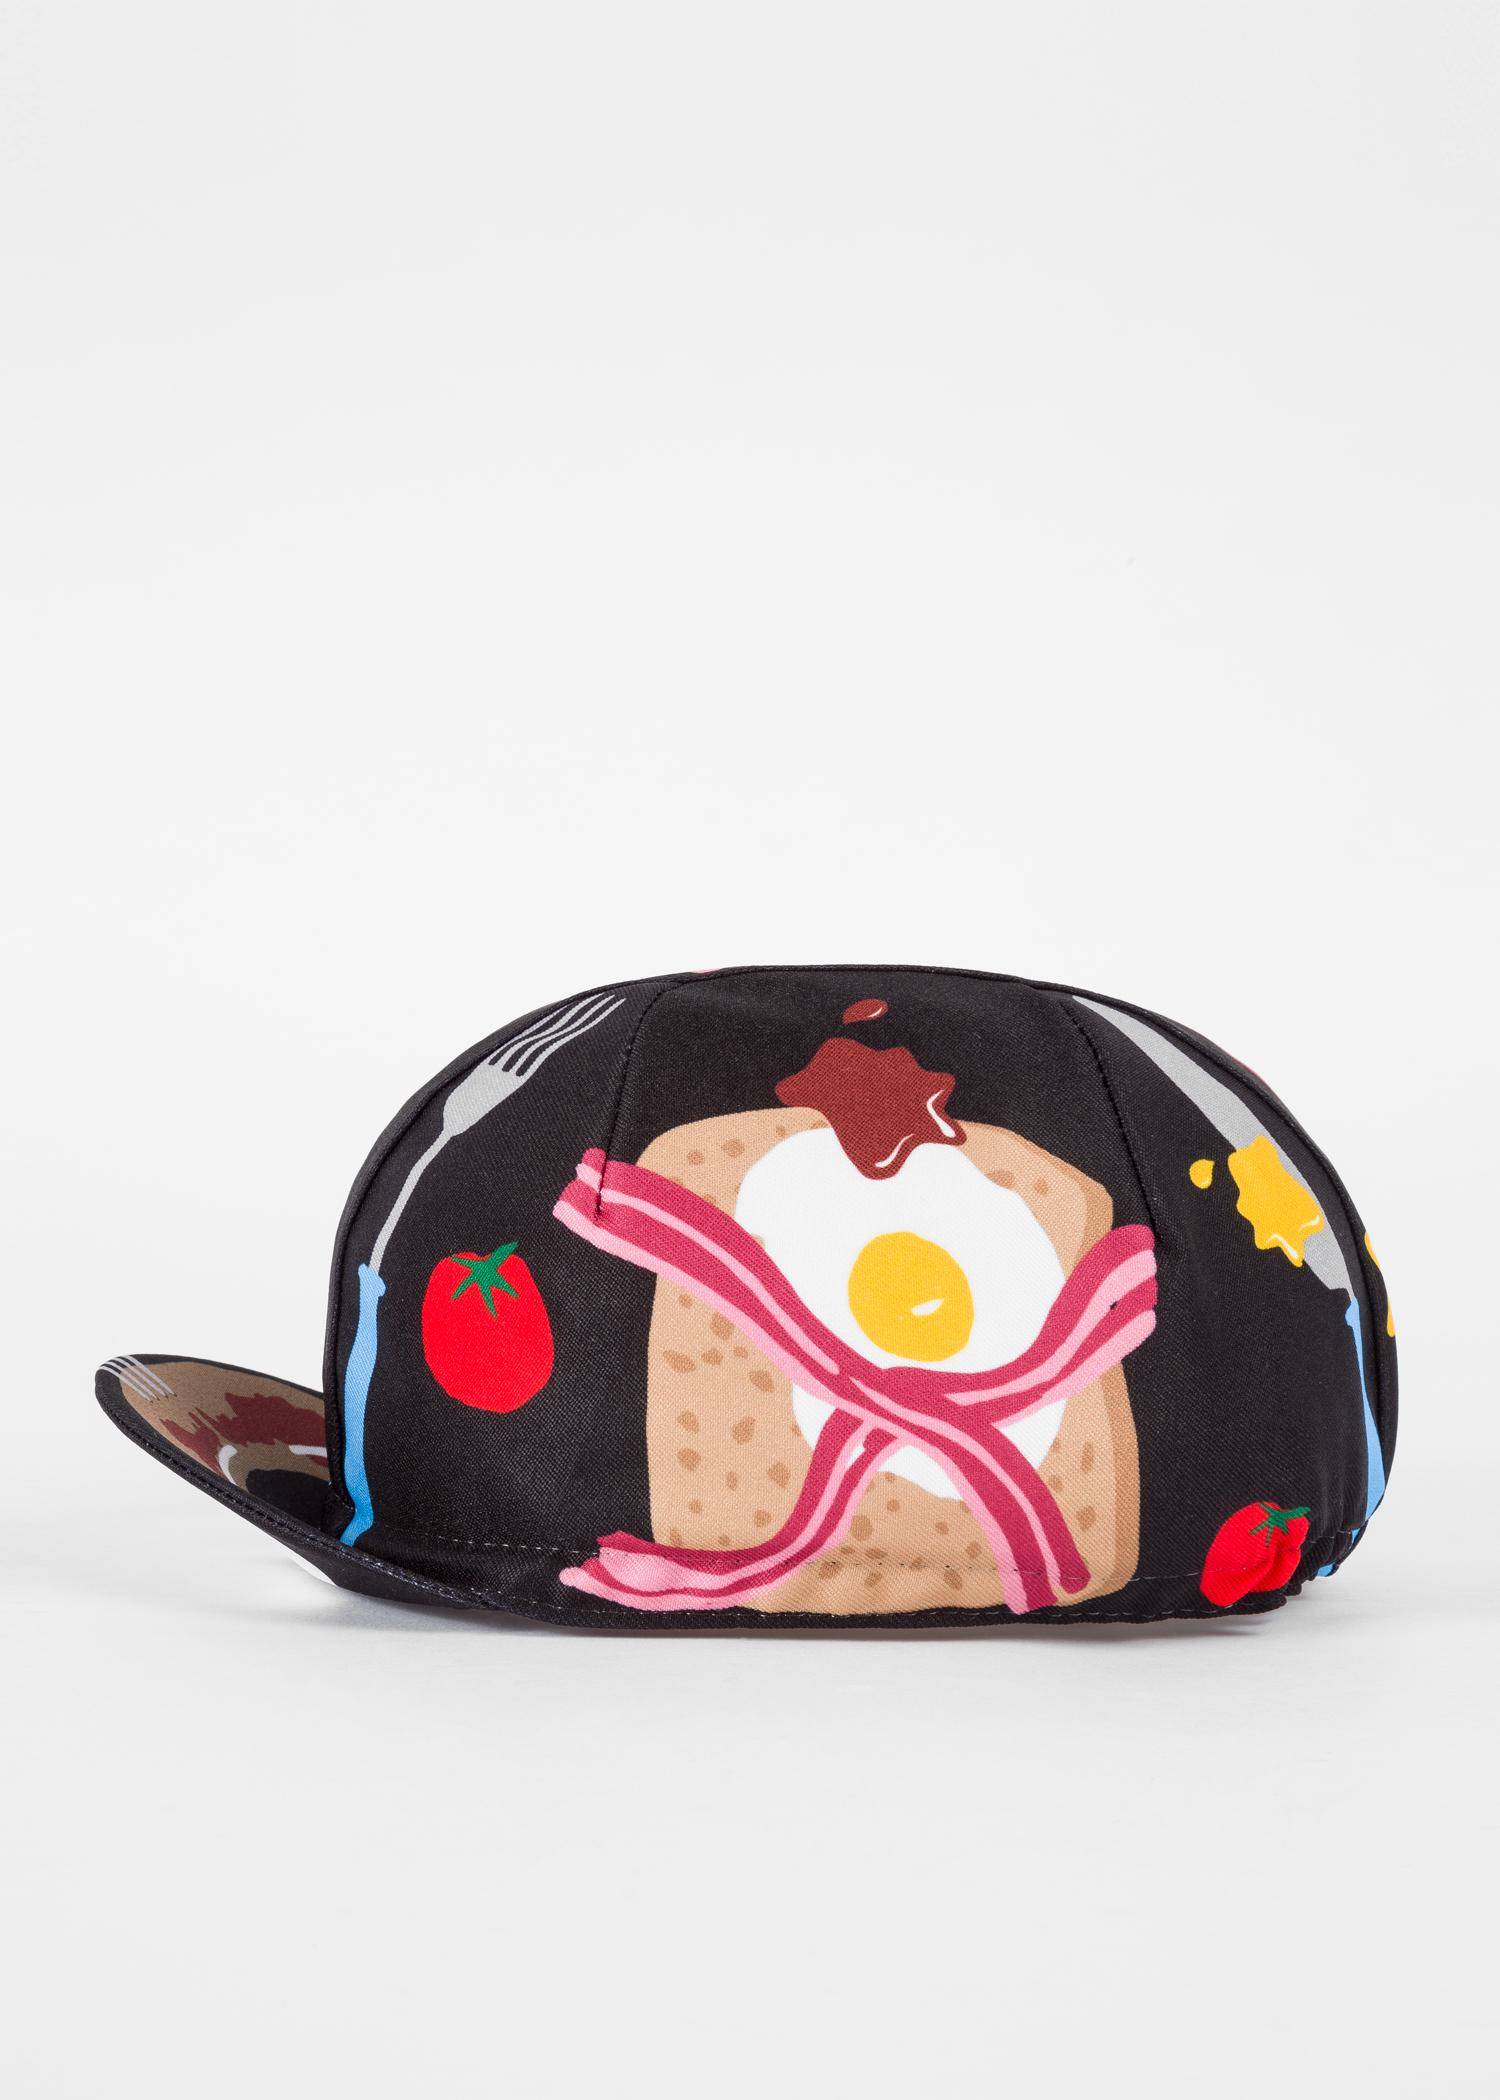 ca35b07fe56 Paul Smith + Cinelli  Egg And Bacon  Cycling Cap - Paul Smith